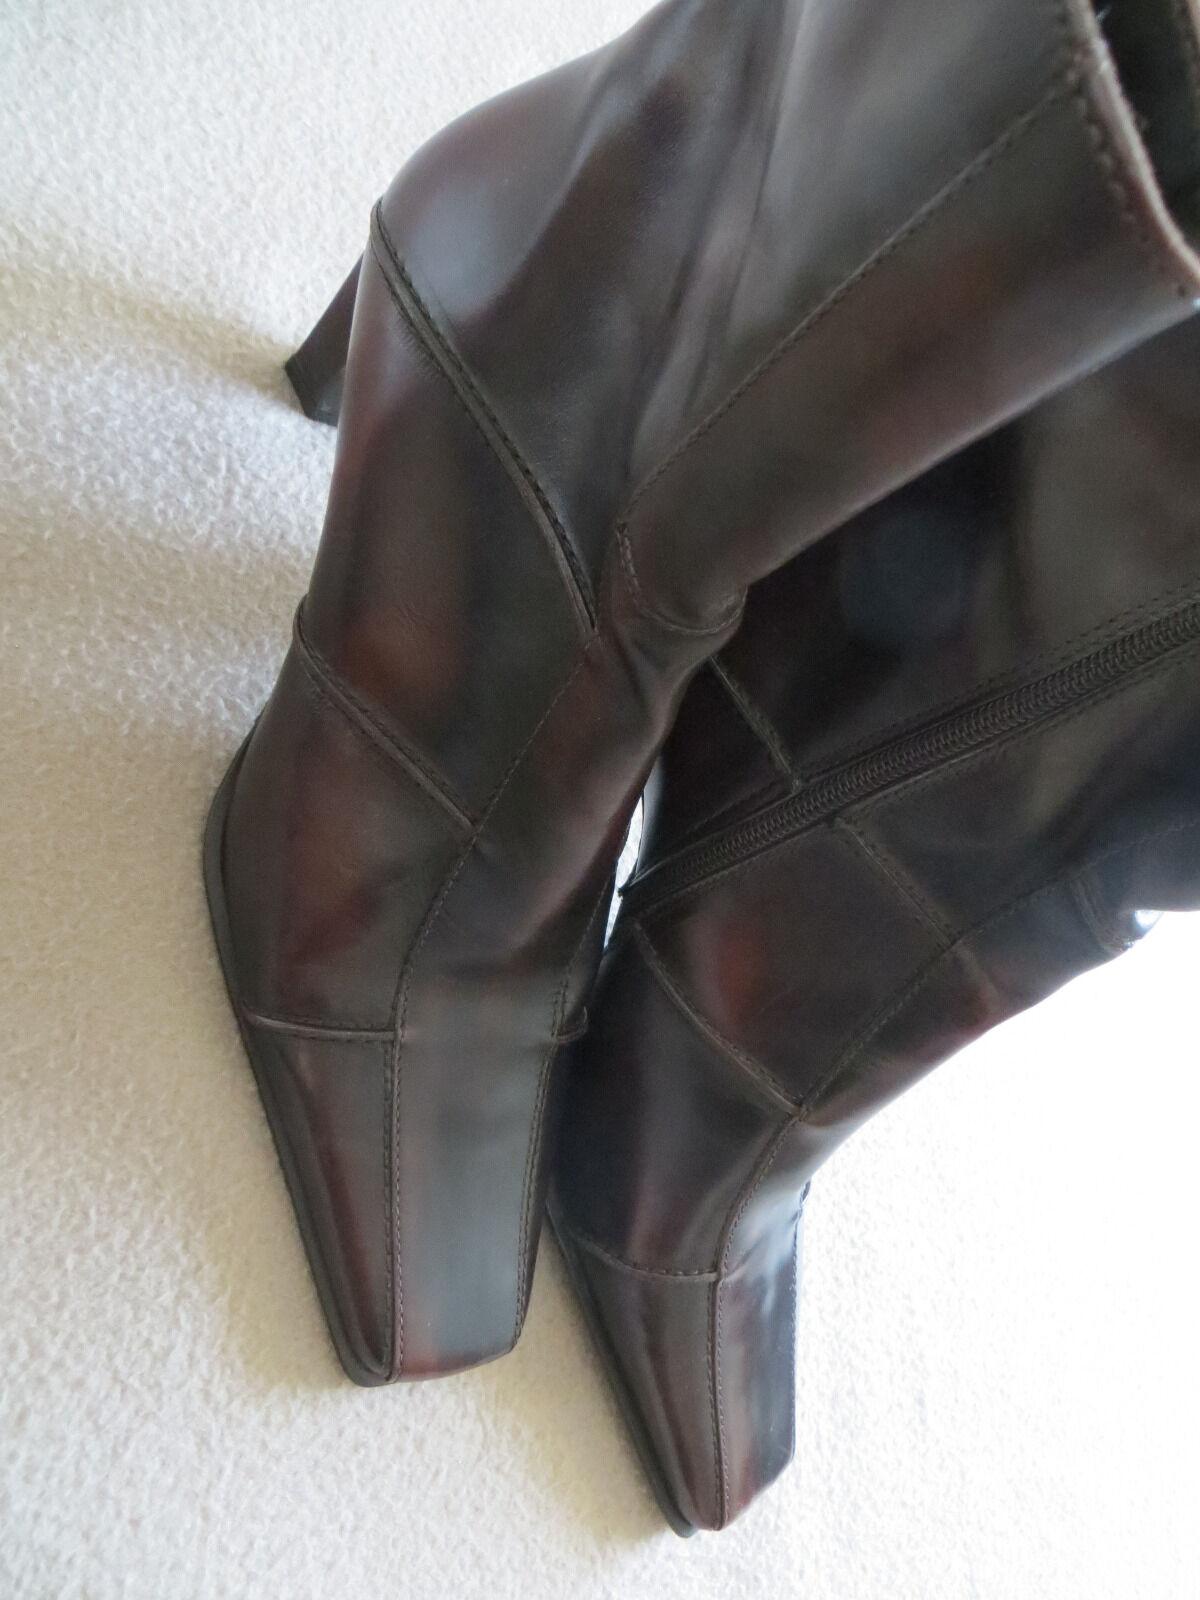 Trendy moderne schicke Stiefelette, Leder, Gr. 41, dunkelbraun, neu, Leder, Stiefelette, Absatz cbff98